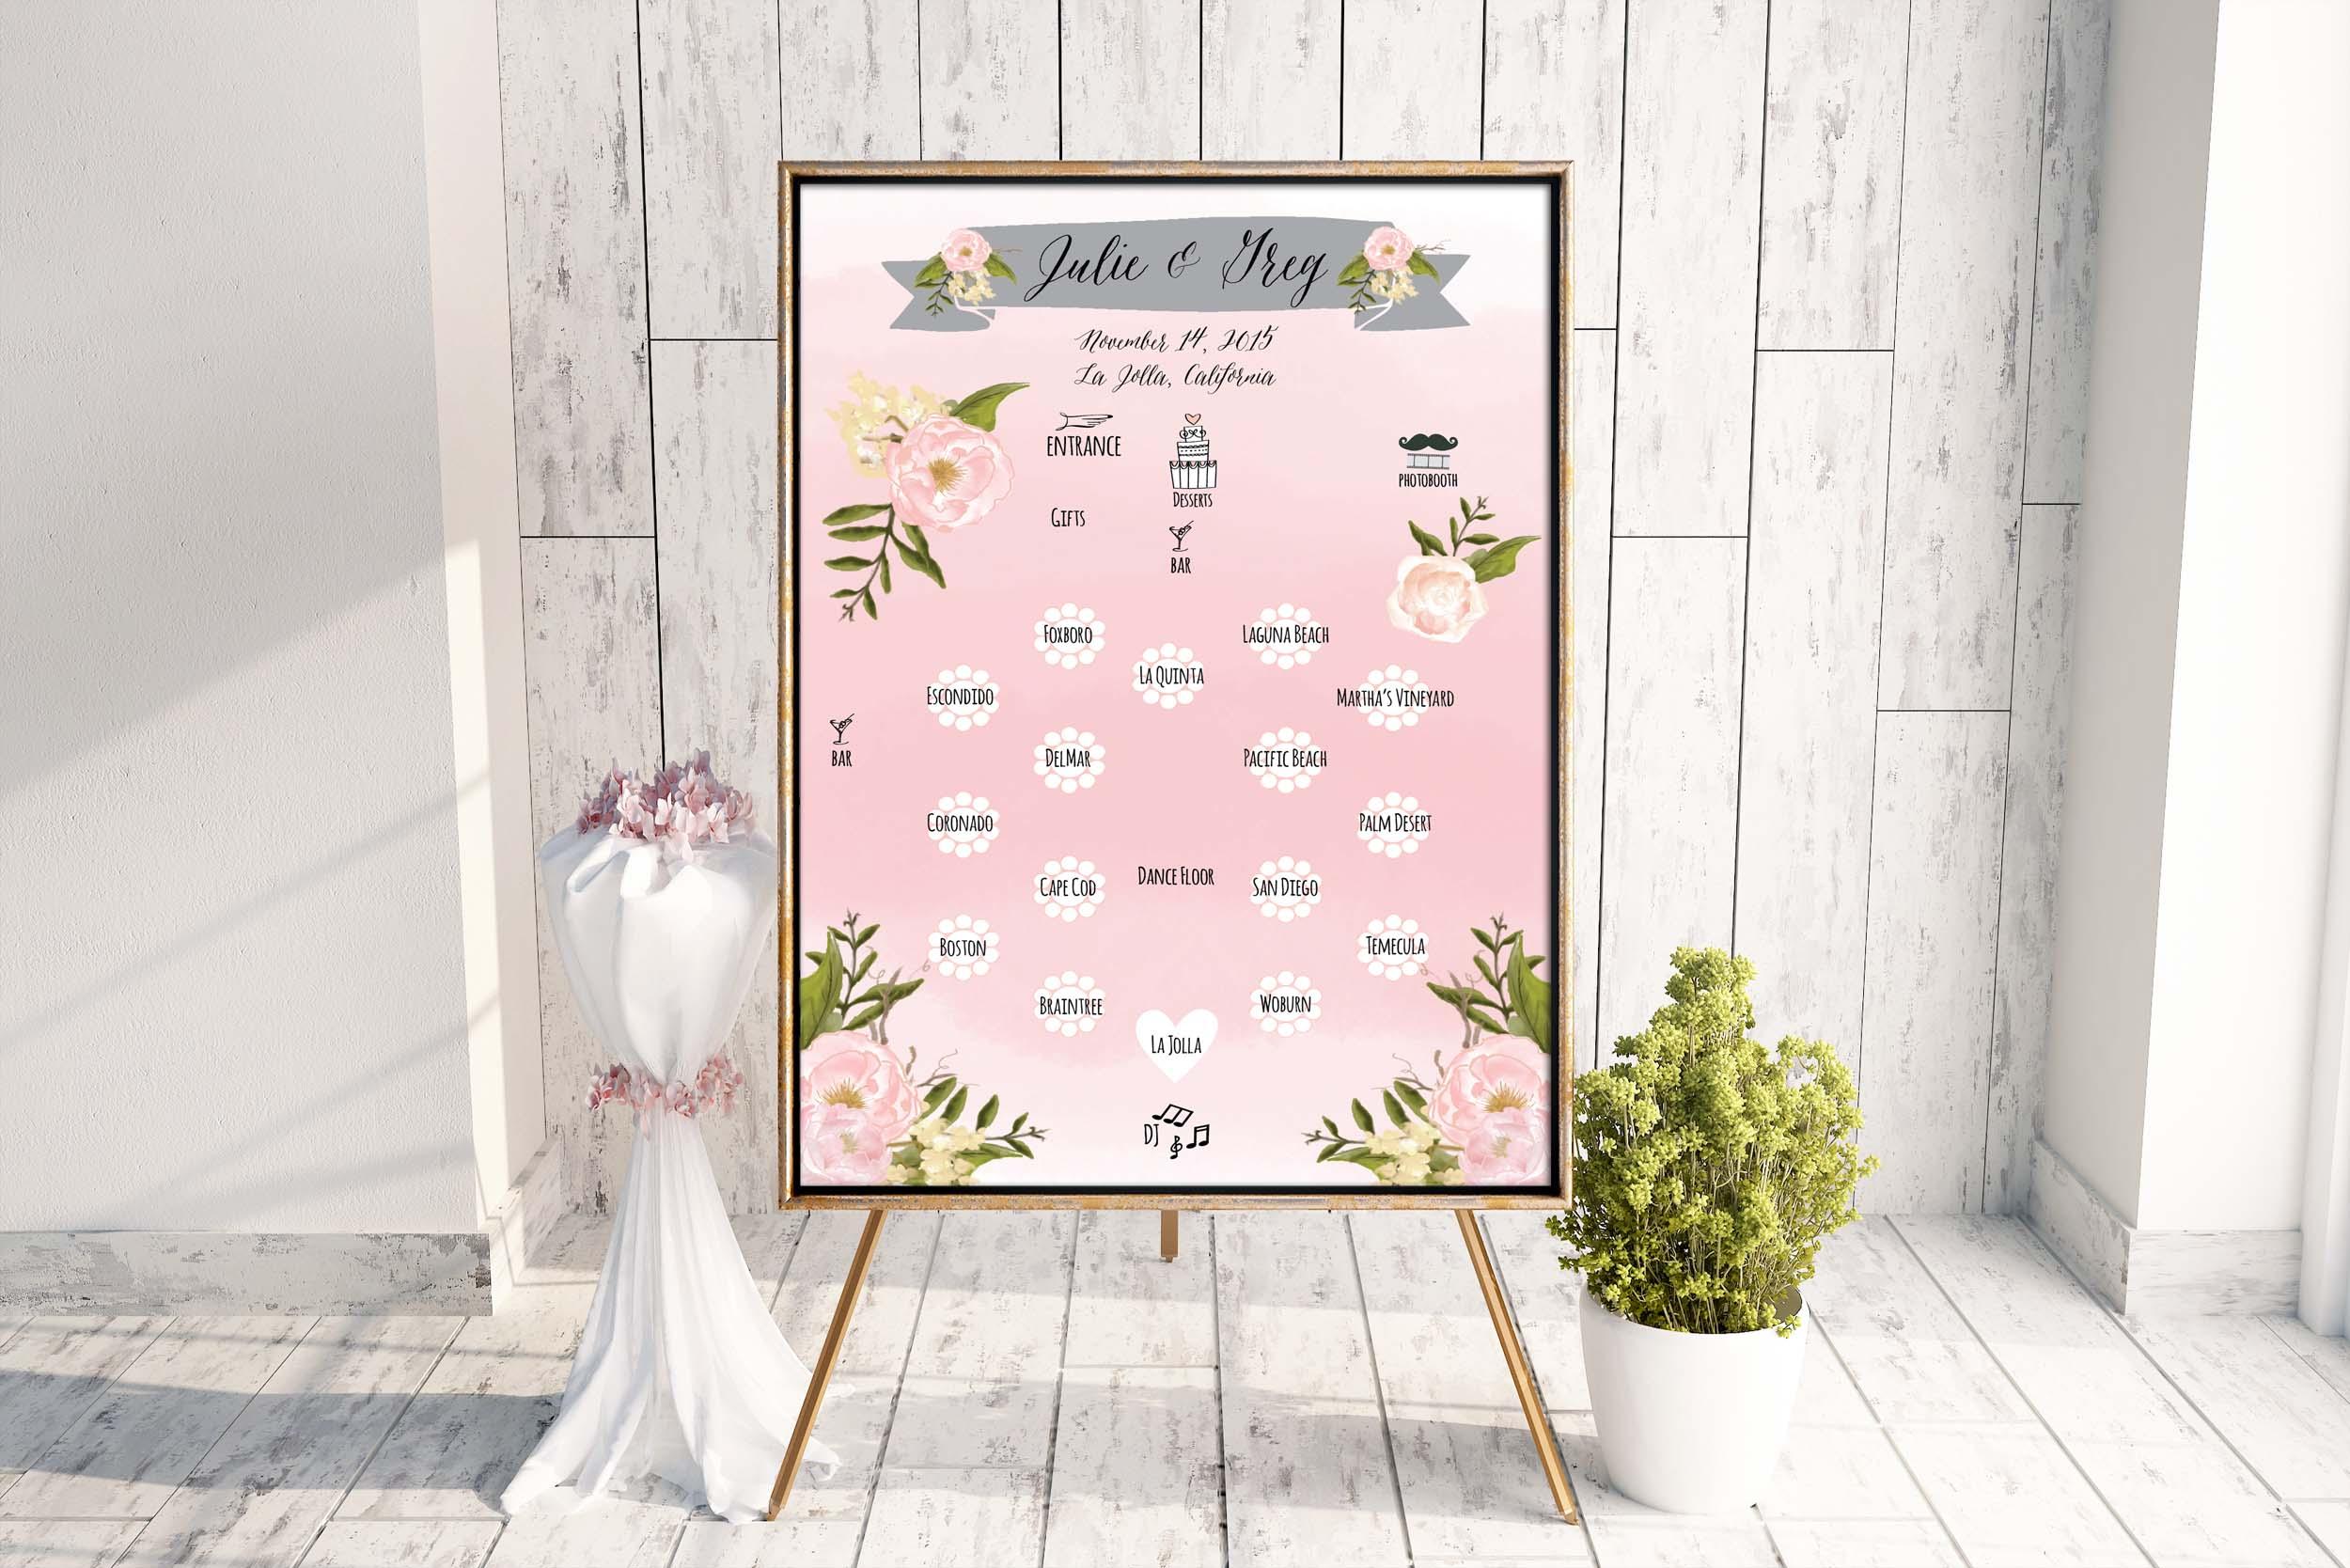 lojolla seating chart floral.jpg